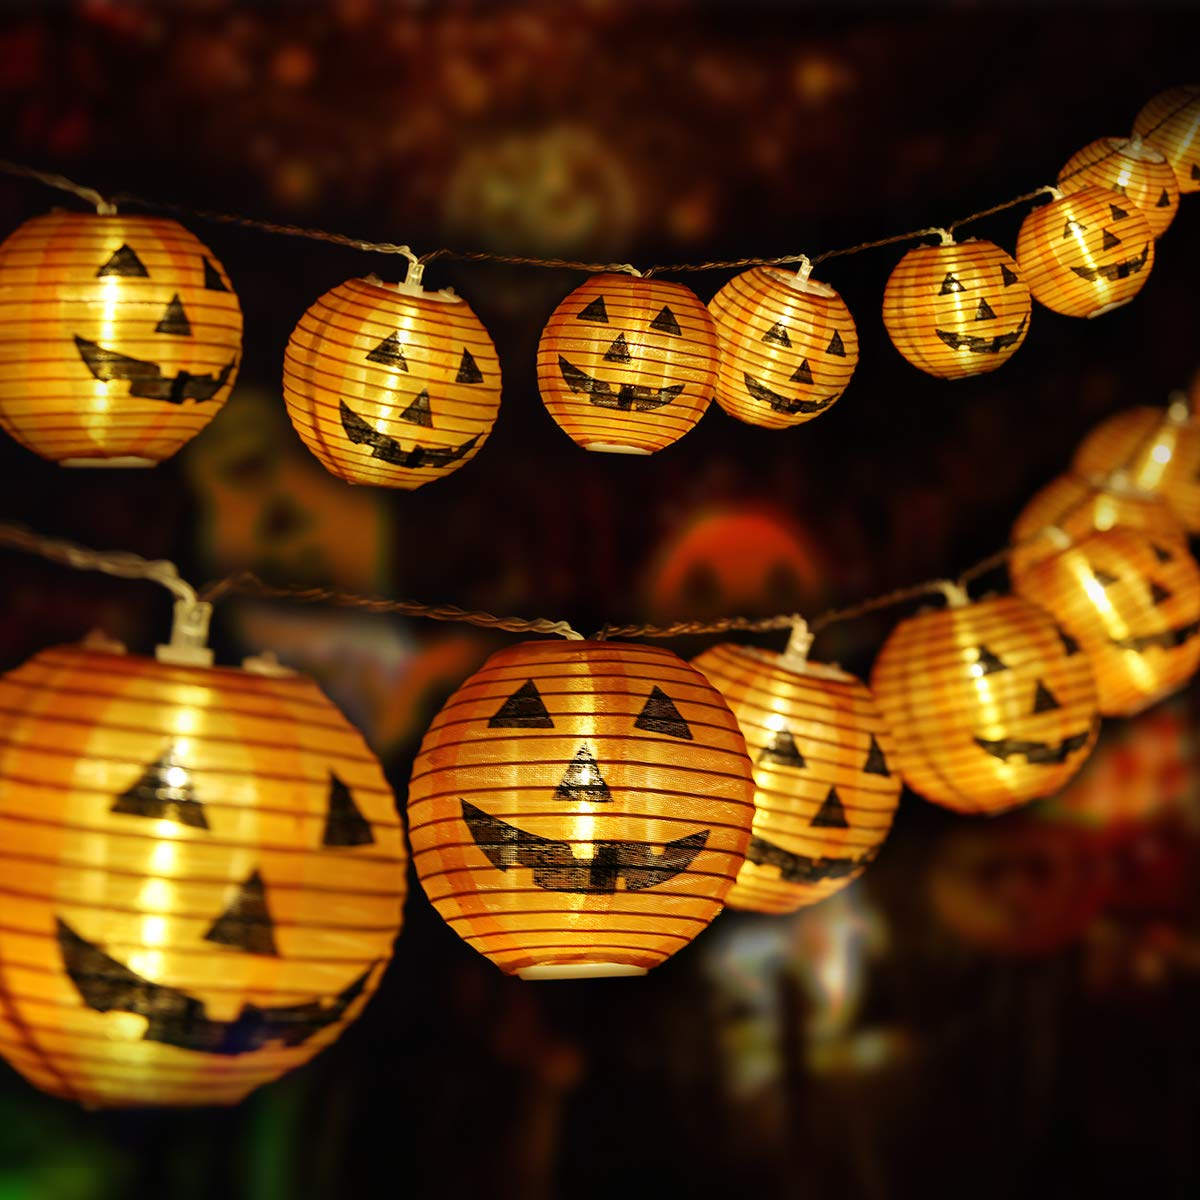 Halloween 3D Pumpkin Strip Light 20 PCS Halloween Decoration LED Lights Powered by Battery Indoor Outdoor Halloween Christmas Festival Decoration